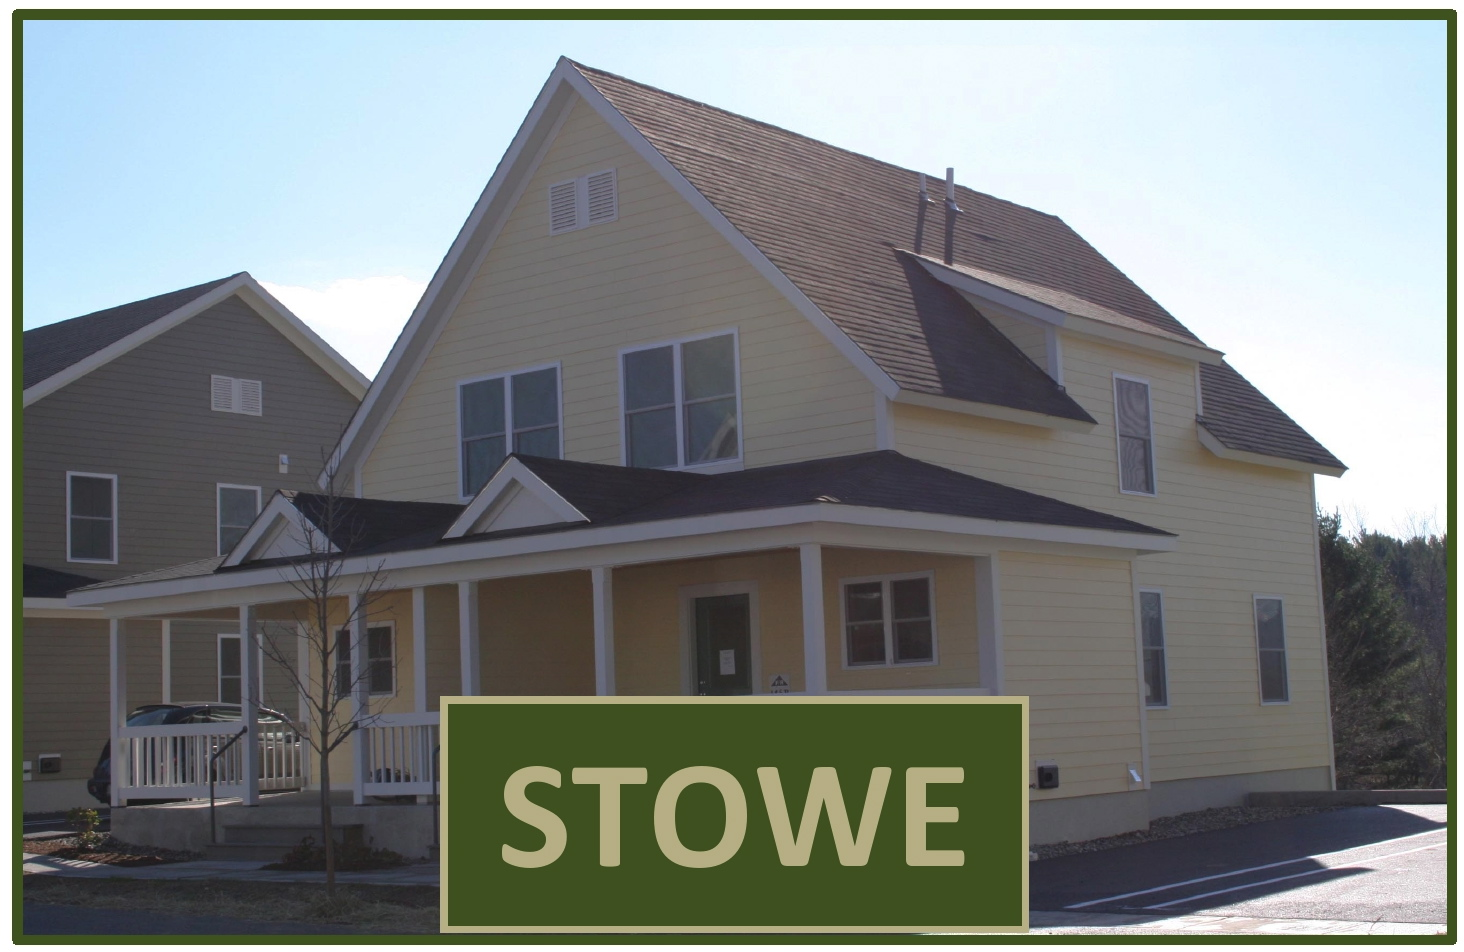 LHP_Stowe_Property